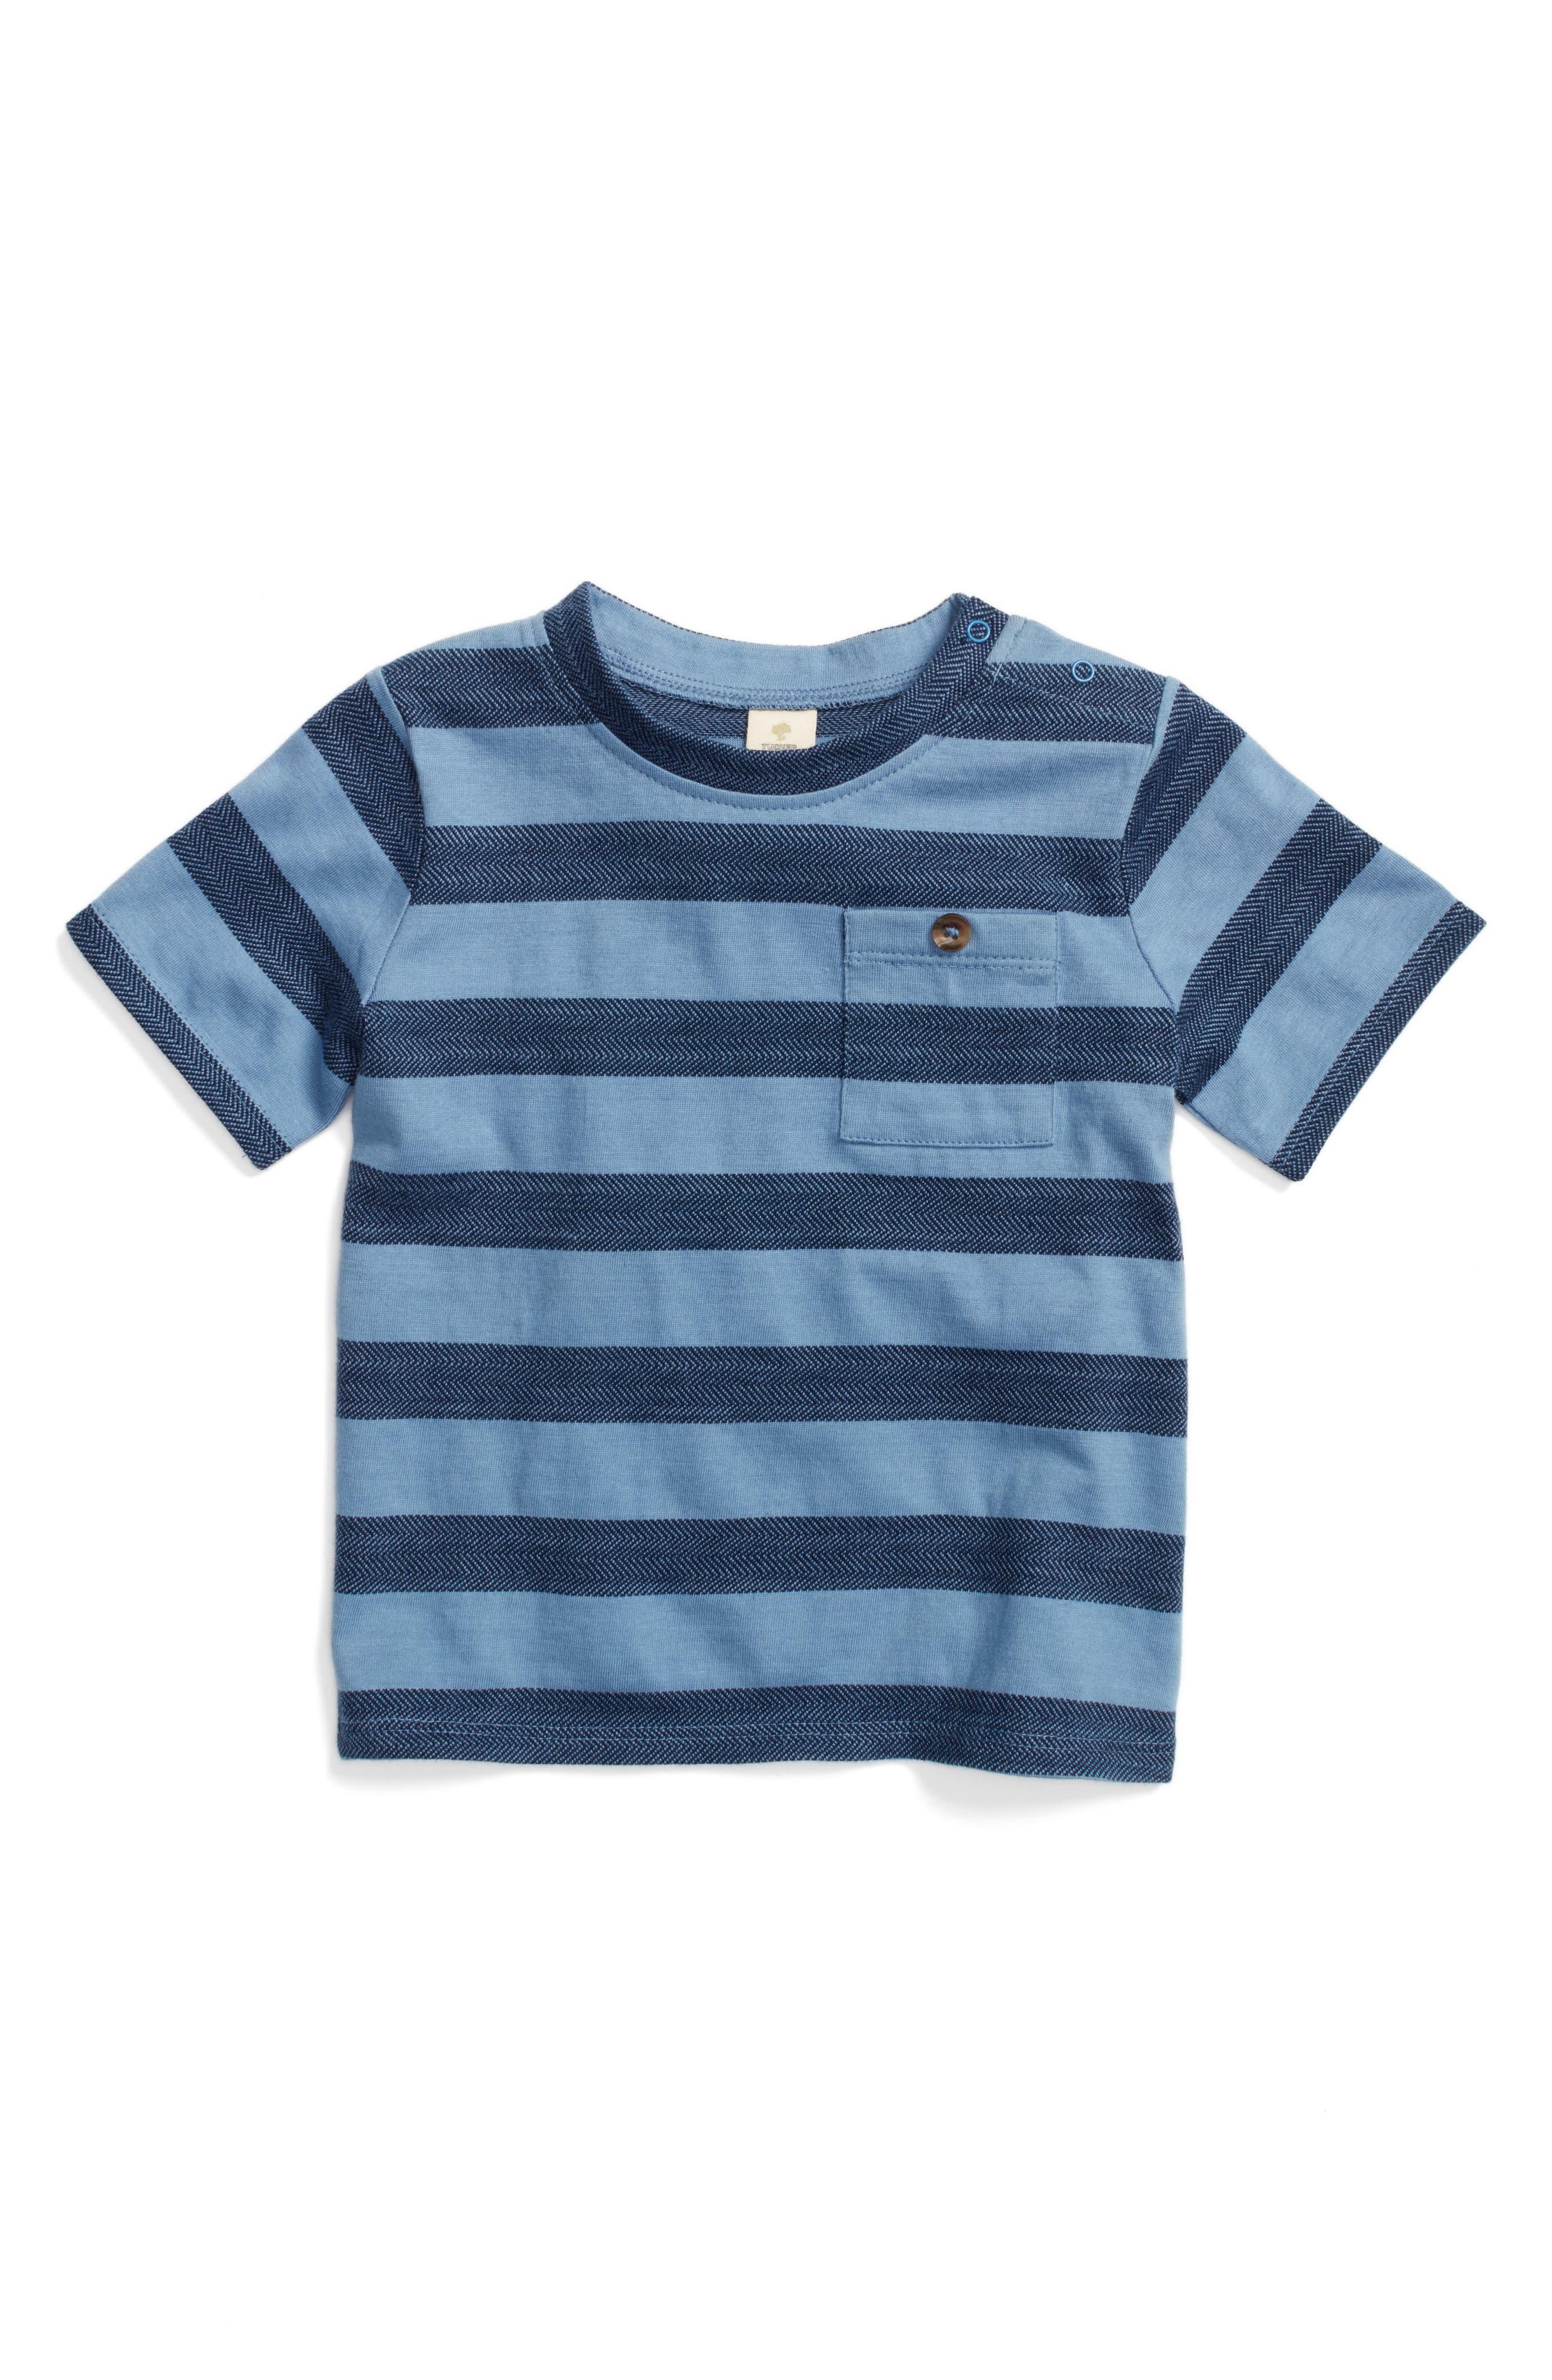 Alternate Image 1 Selected - Tucker + Tate Thomas Stripe T-Shirt (Baby Boys)